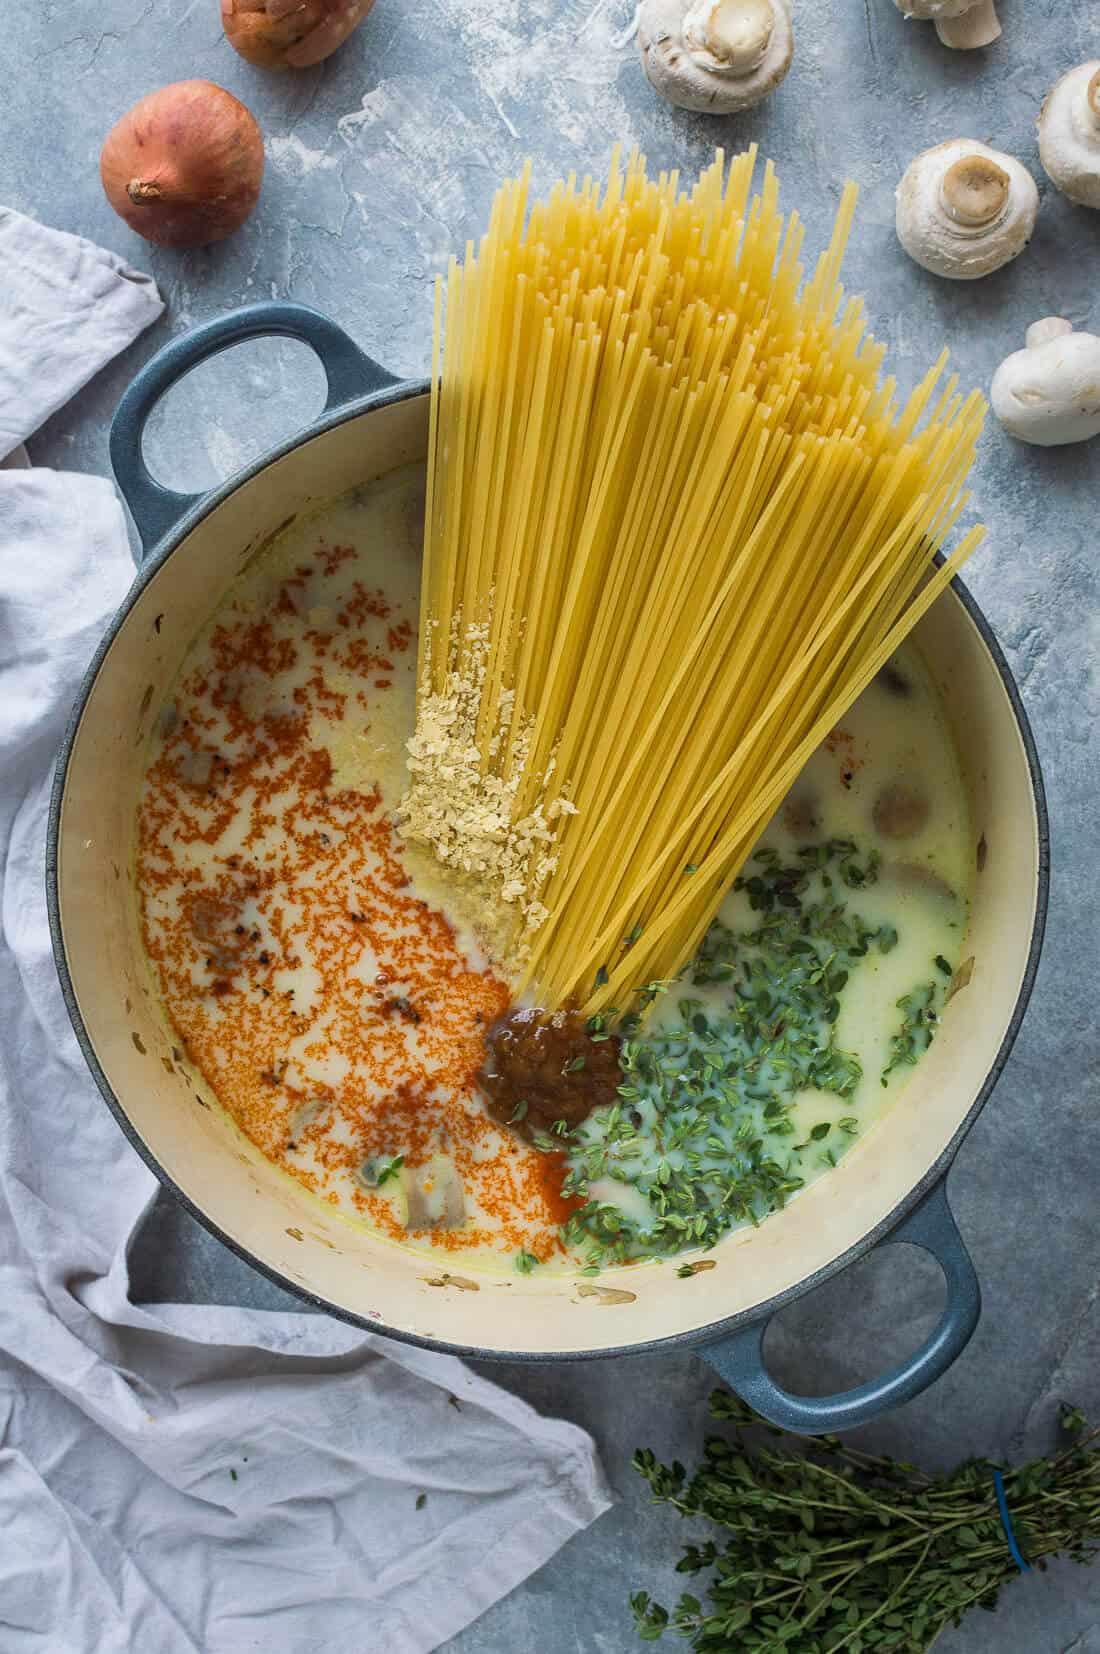 Vegan one pot mushroom pasta ingredients in a pot